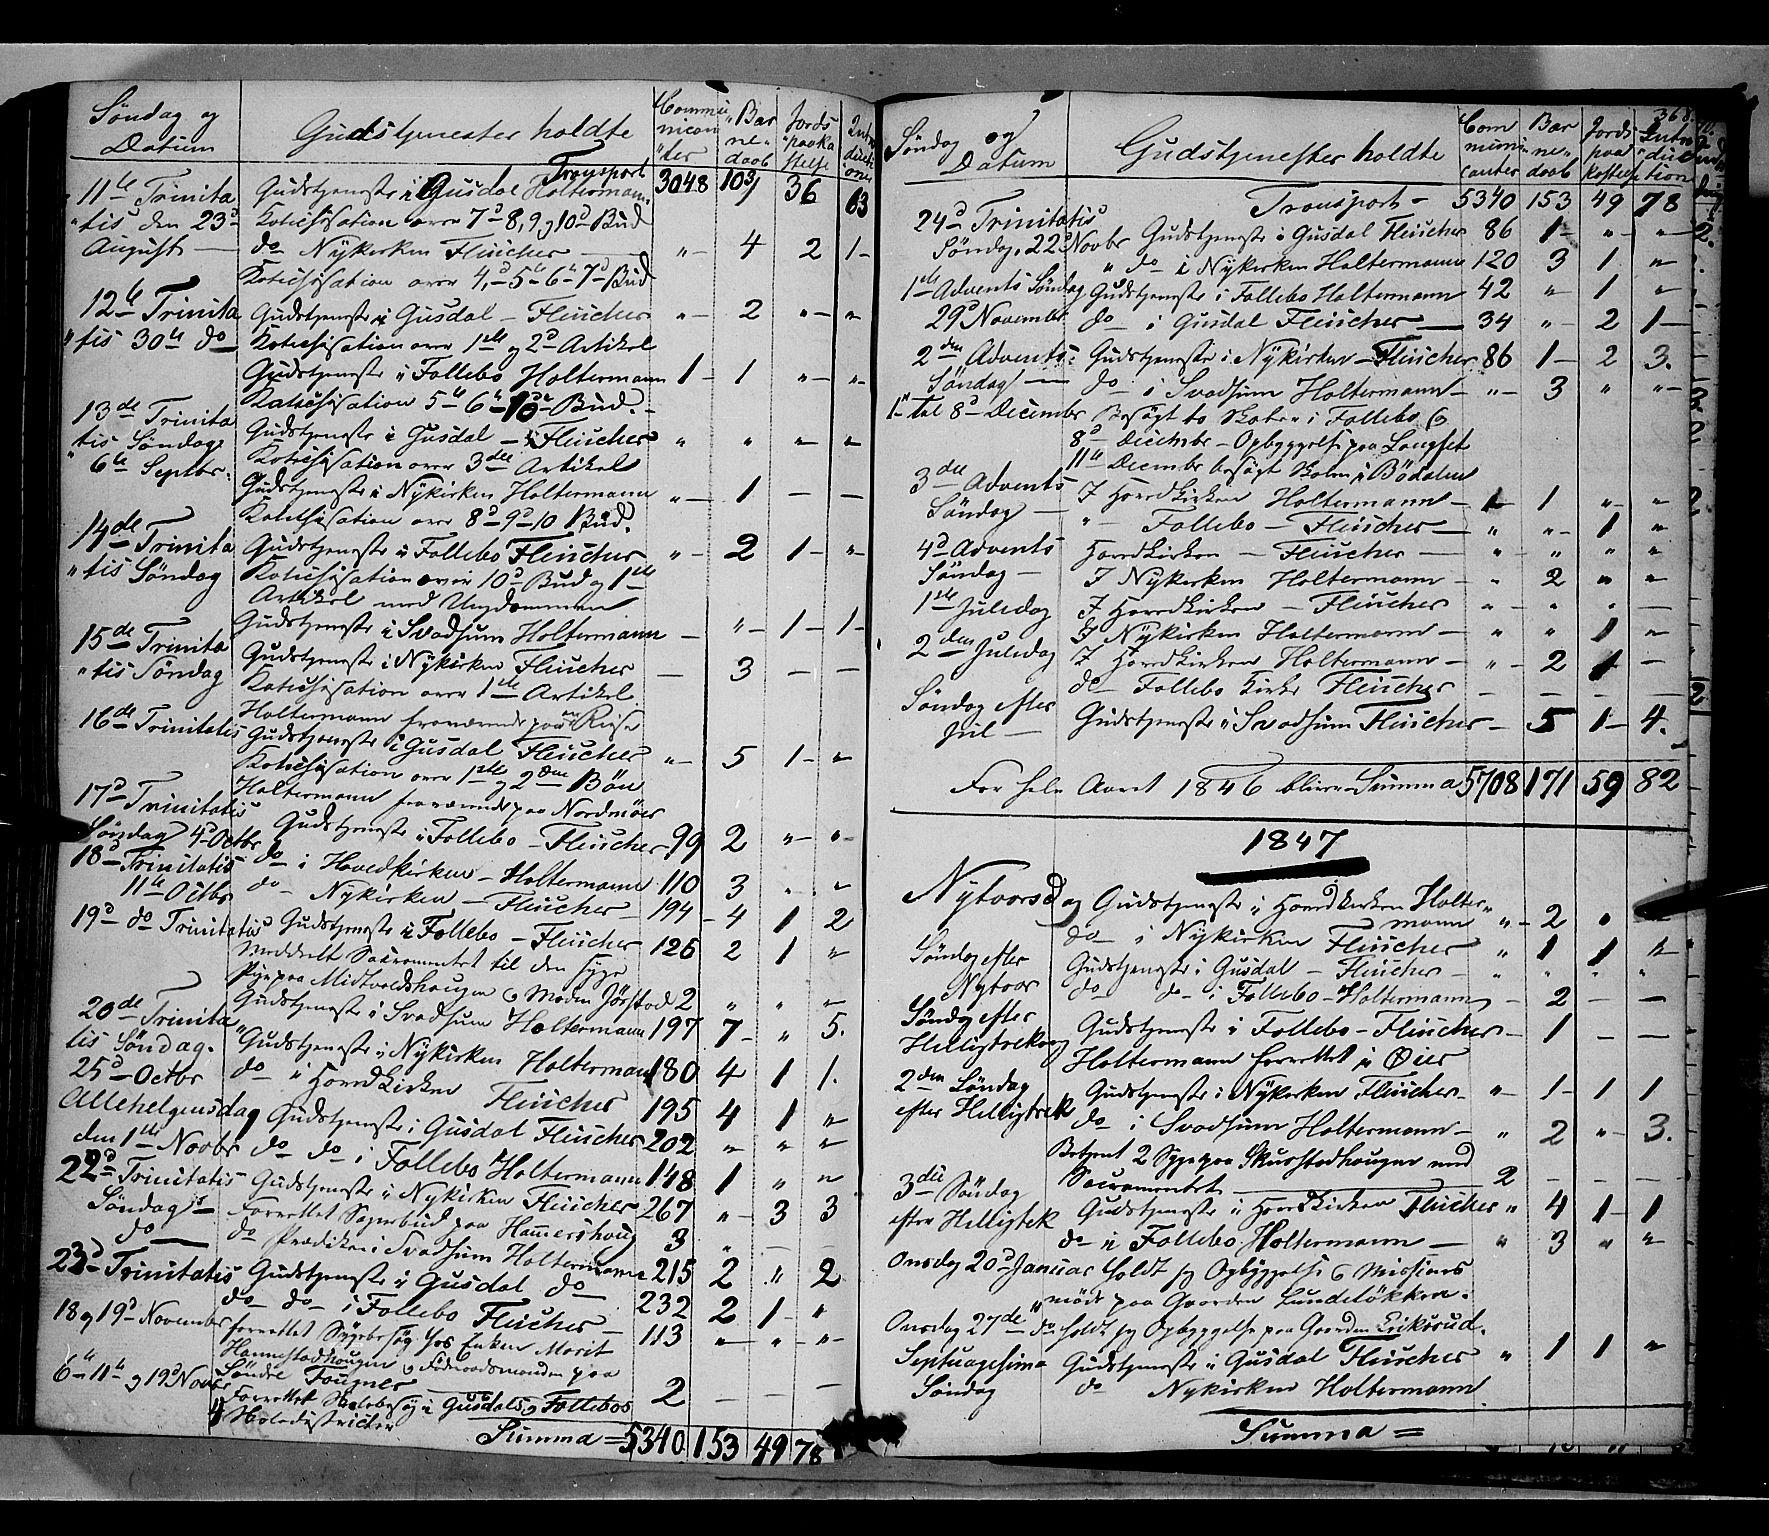 SAH, Gausdal prestekontor, Ministerialbok nr. 7, 1840-1850, s. 368